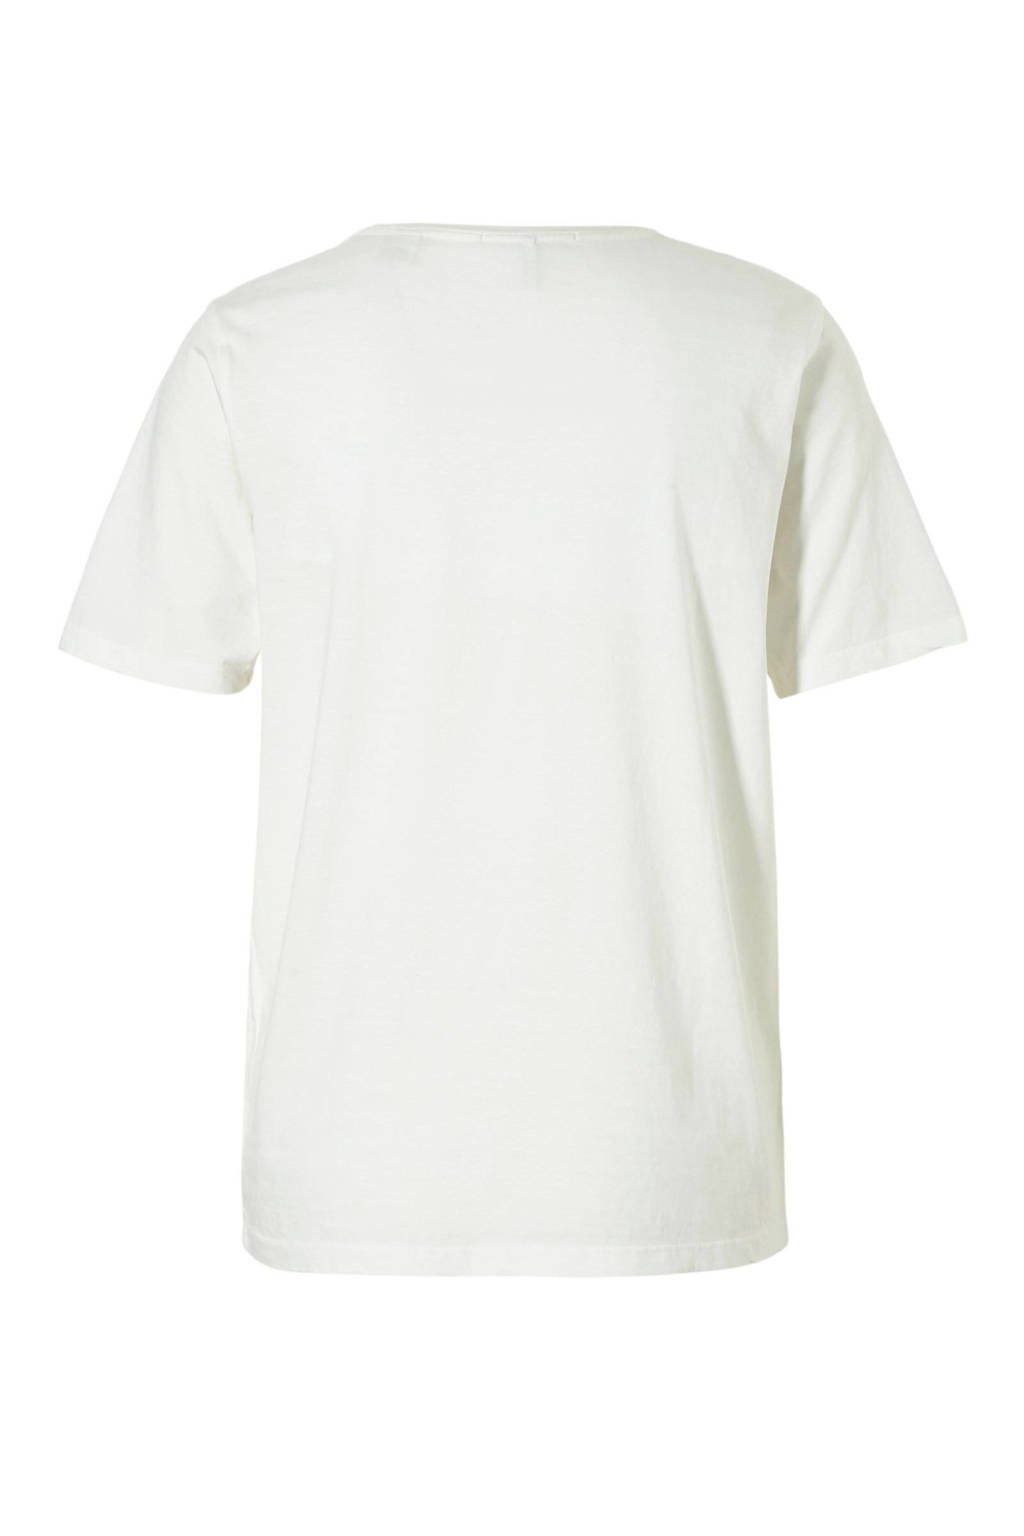 Tekstopdruk Met shirt amp; Scotch Sodat nIZwYgqxTa